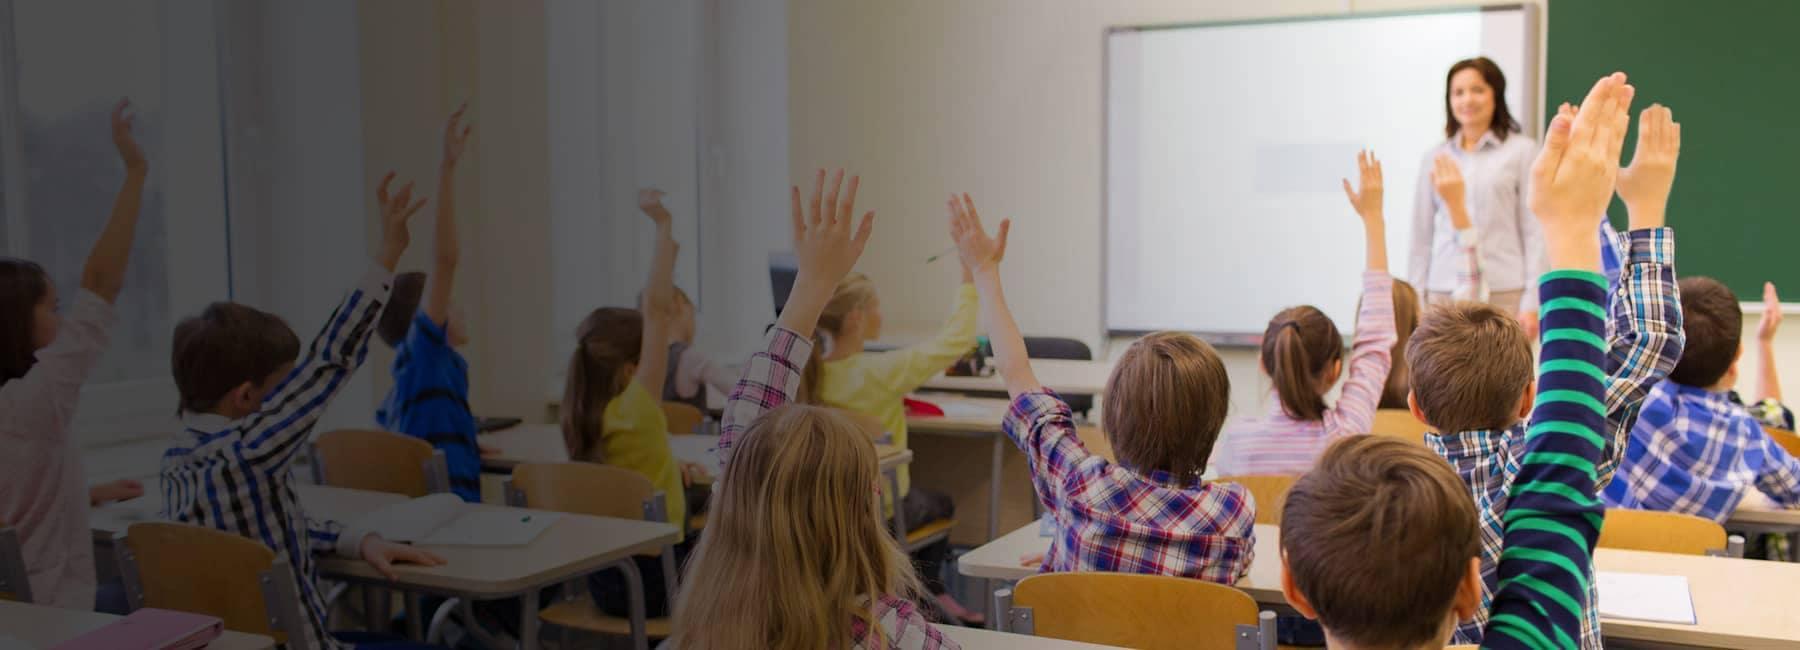 Children Raising Hands for Teacher in Classroom